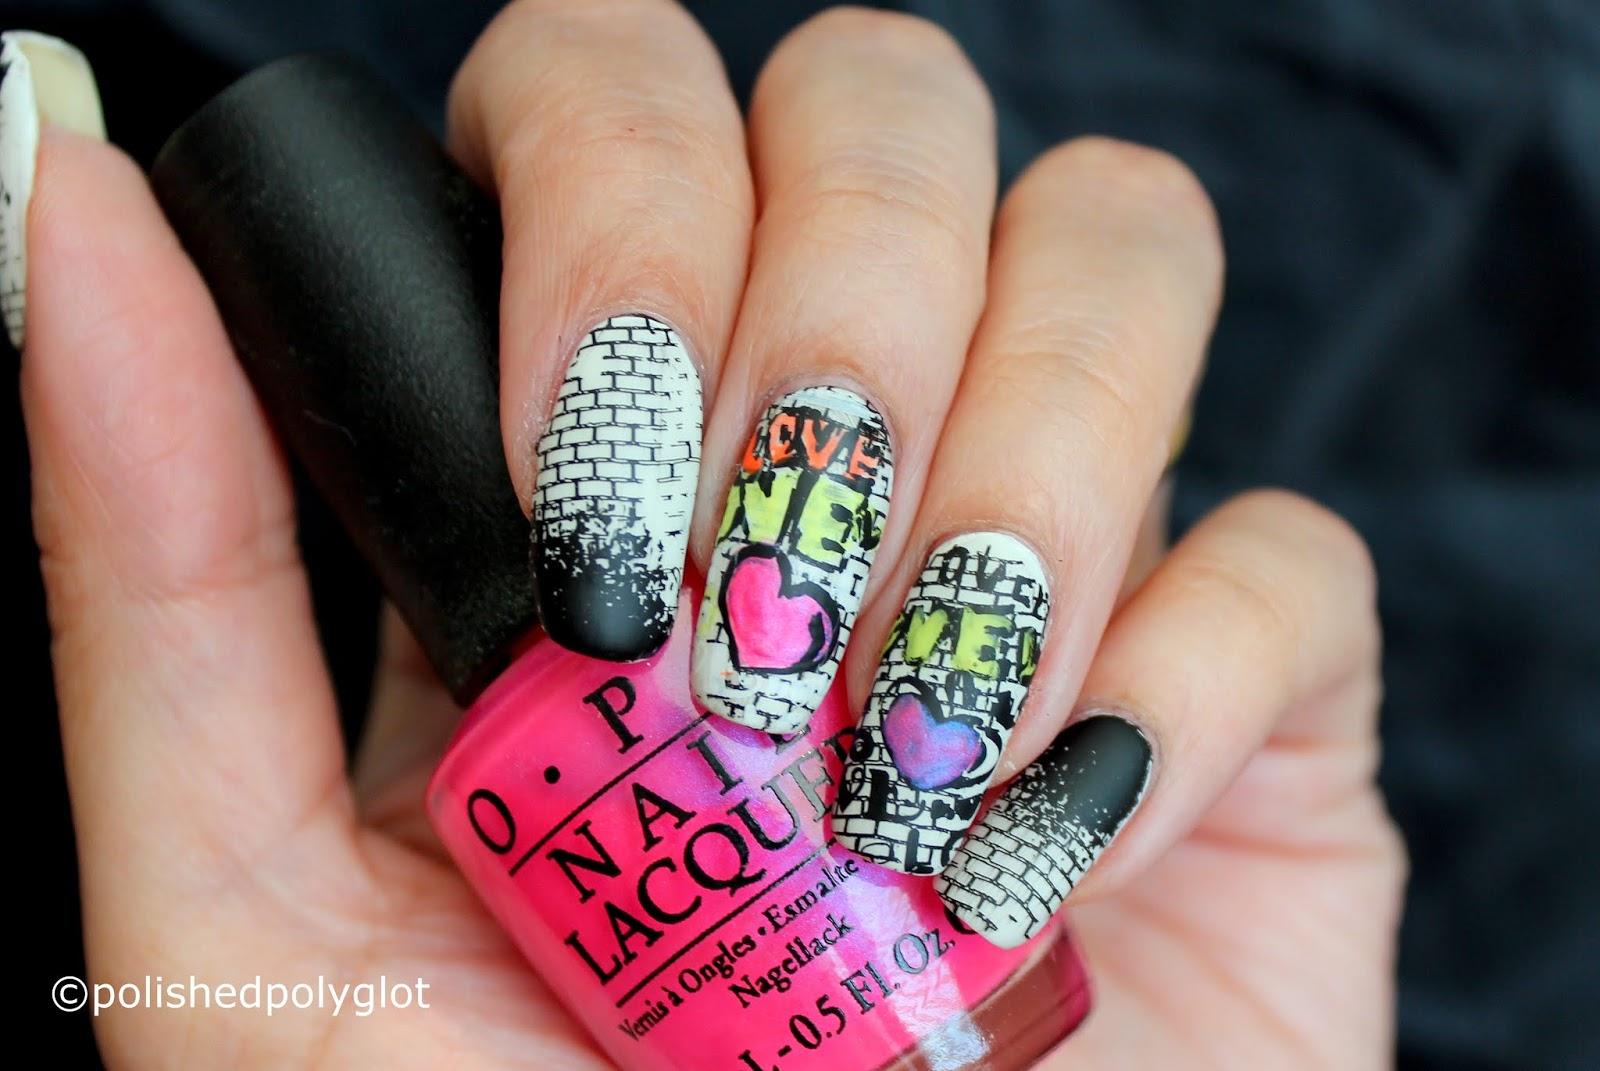 Nail Art Graffiti Nails 26 Great Nail Art Ideas Polished Polyglot